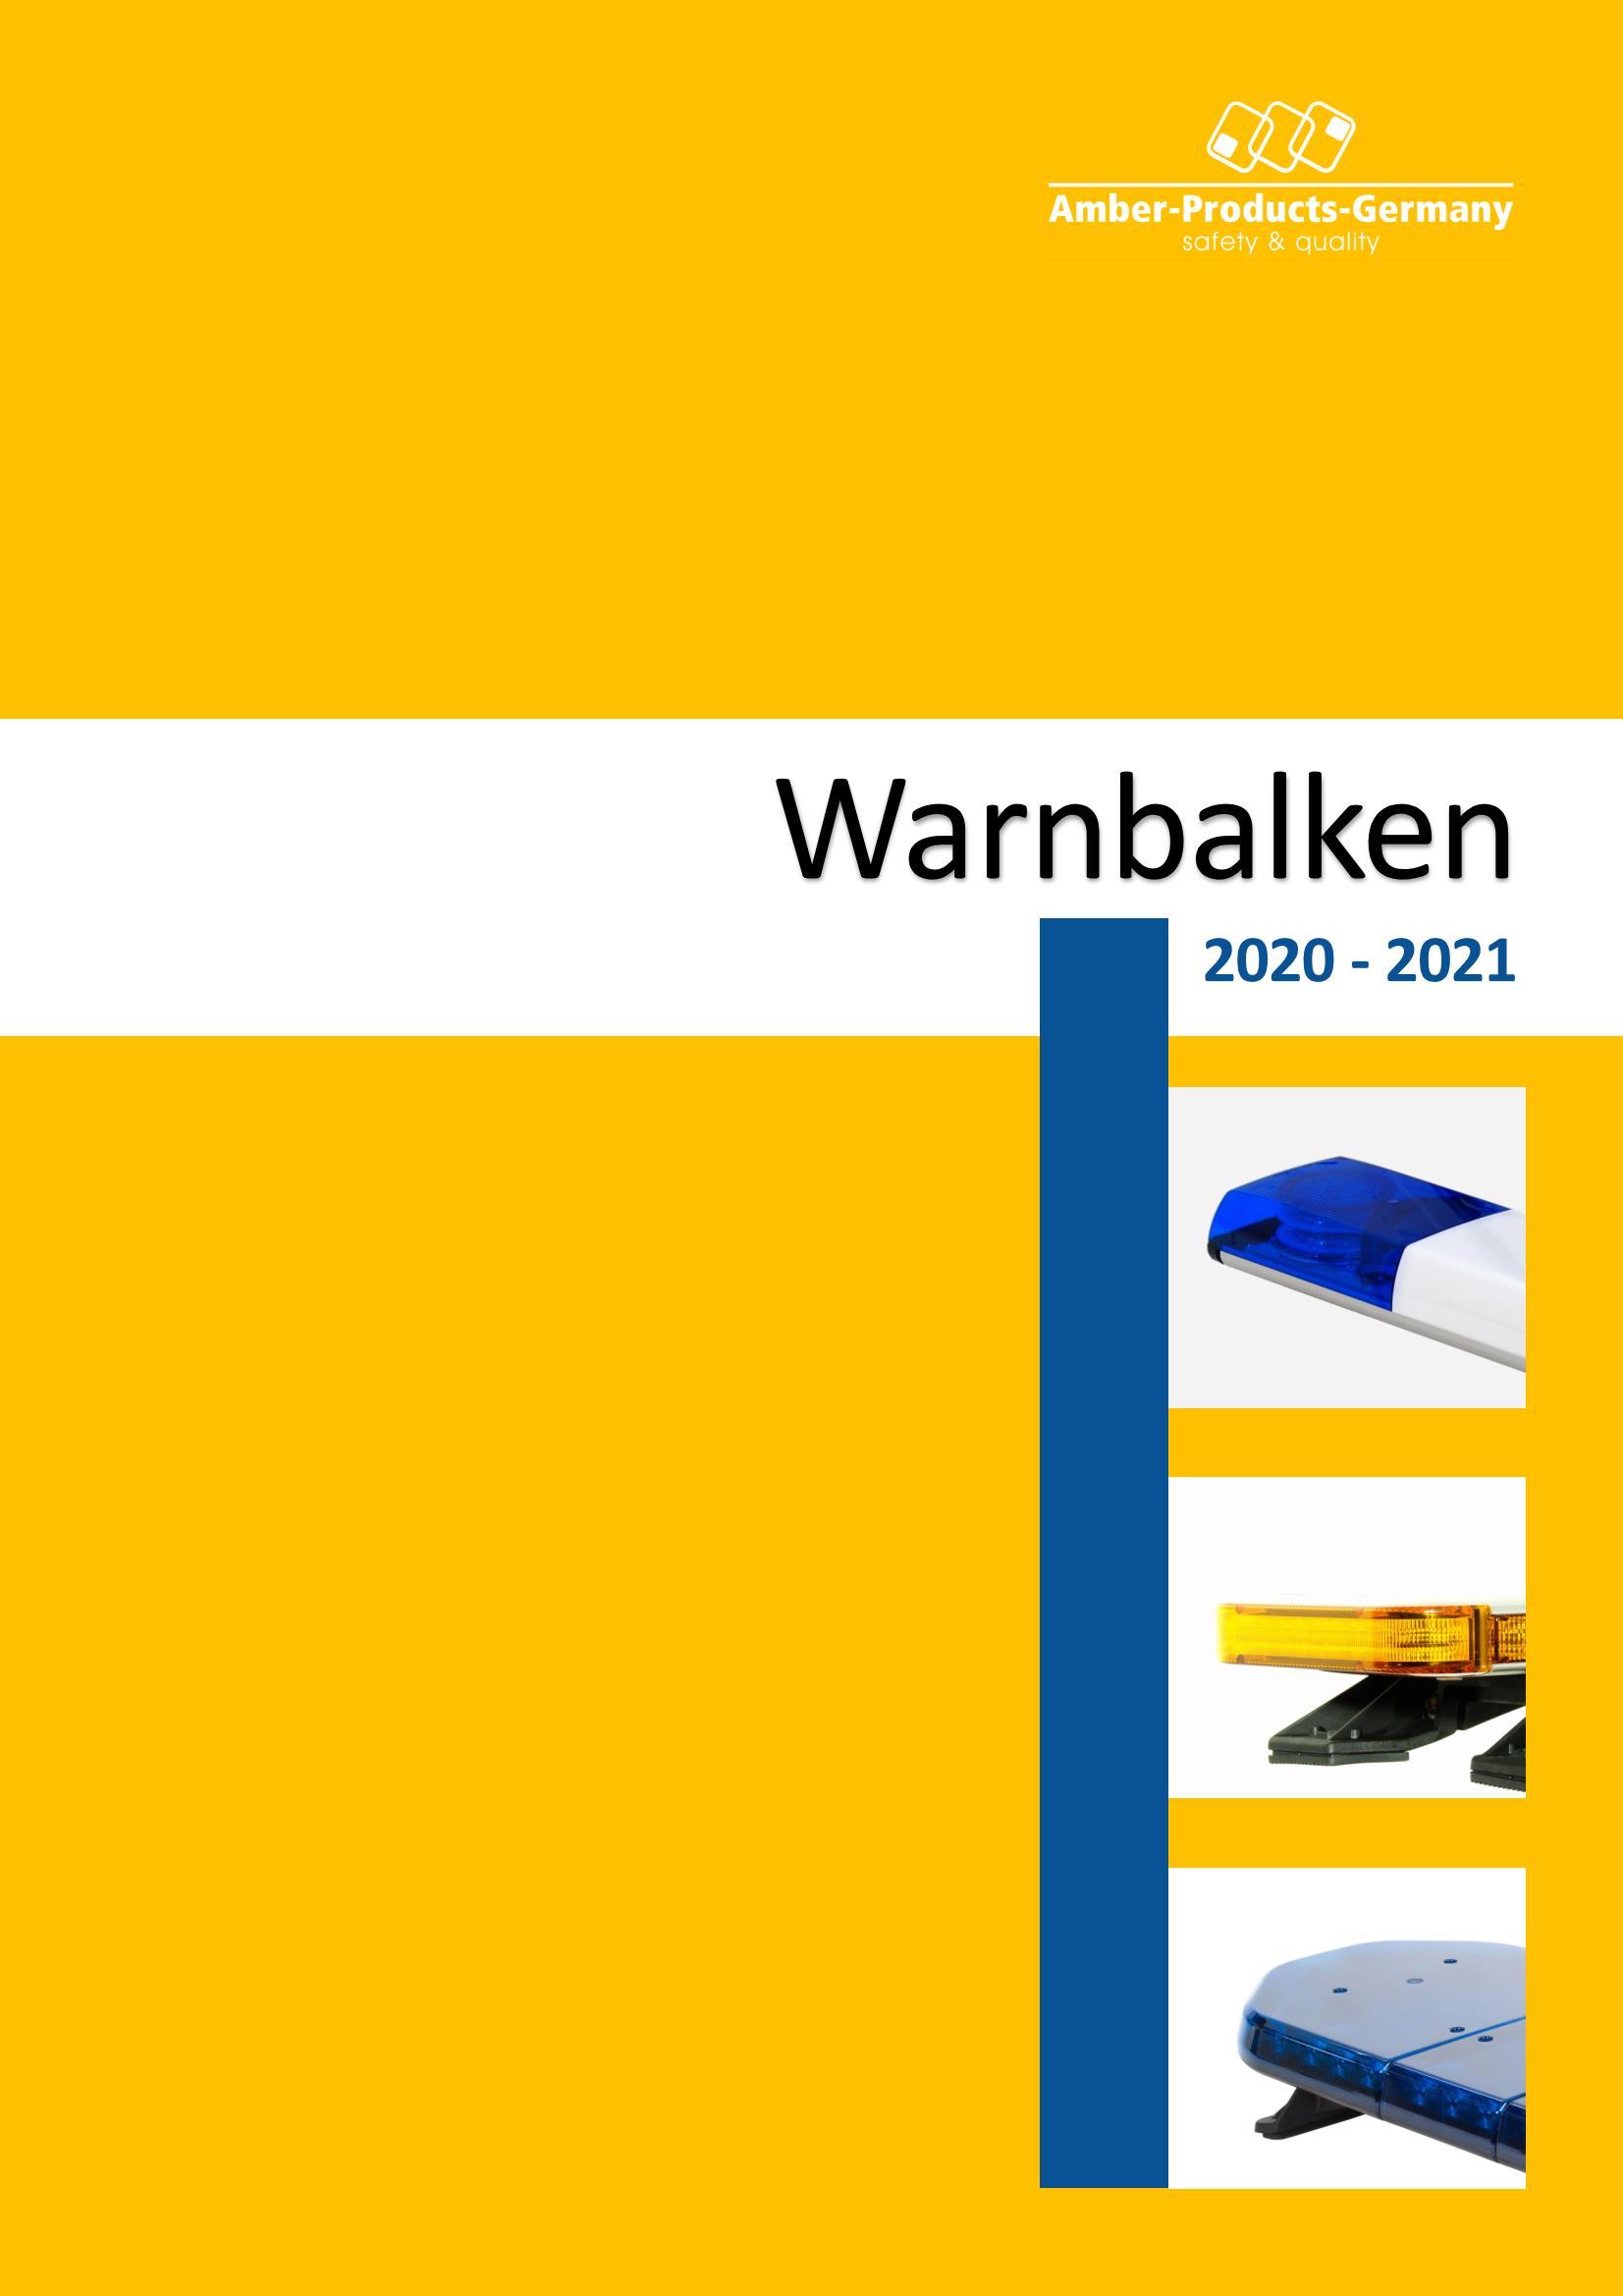 Warnbalken_Katalog_2020-2021